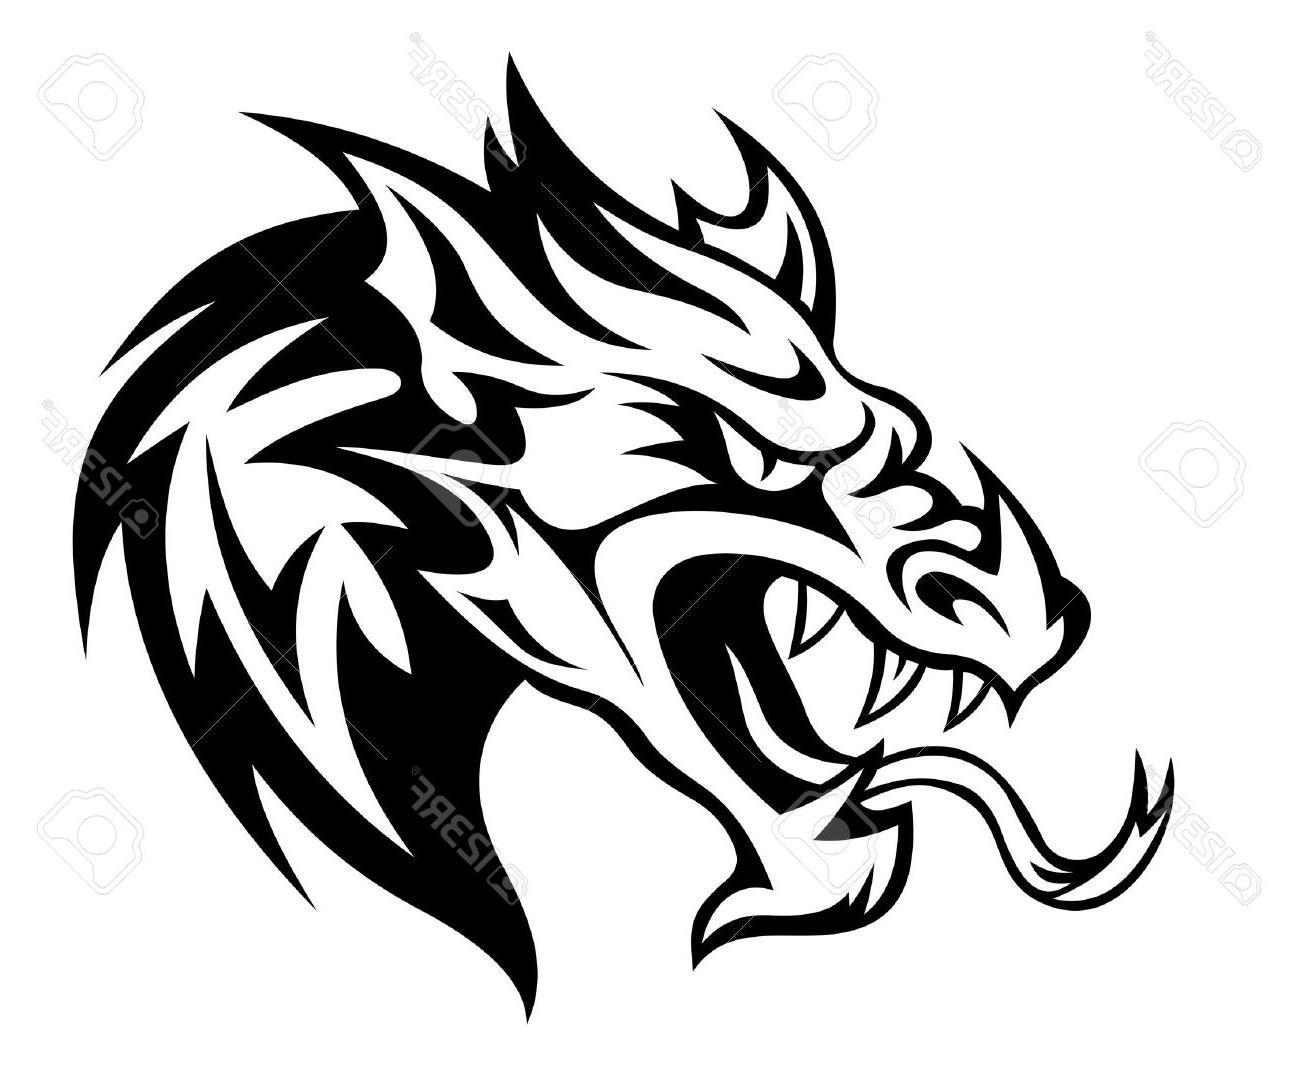 1300x1074 Best Free Danger Dragon Head For Tattoo Vector Illustration Stock